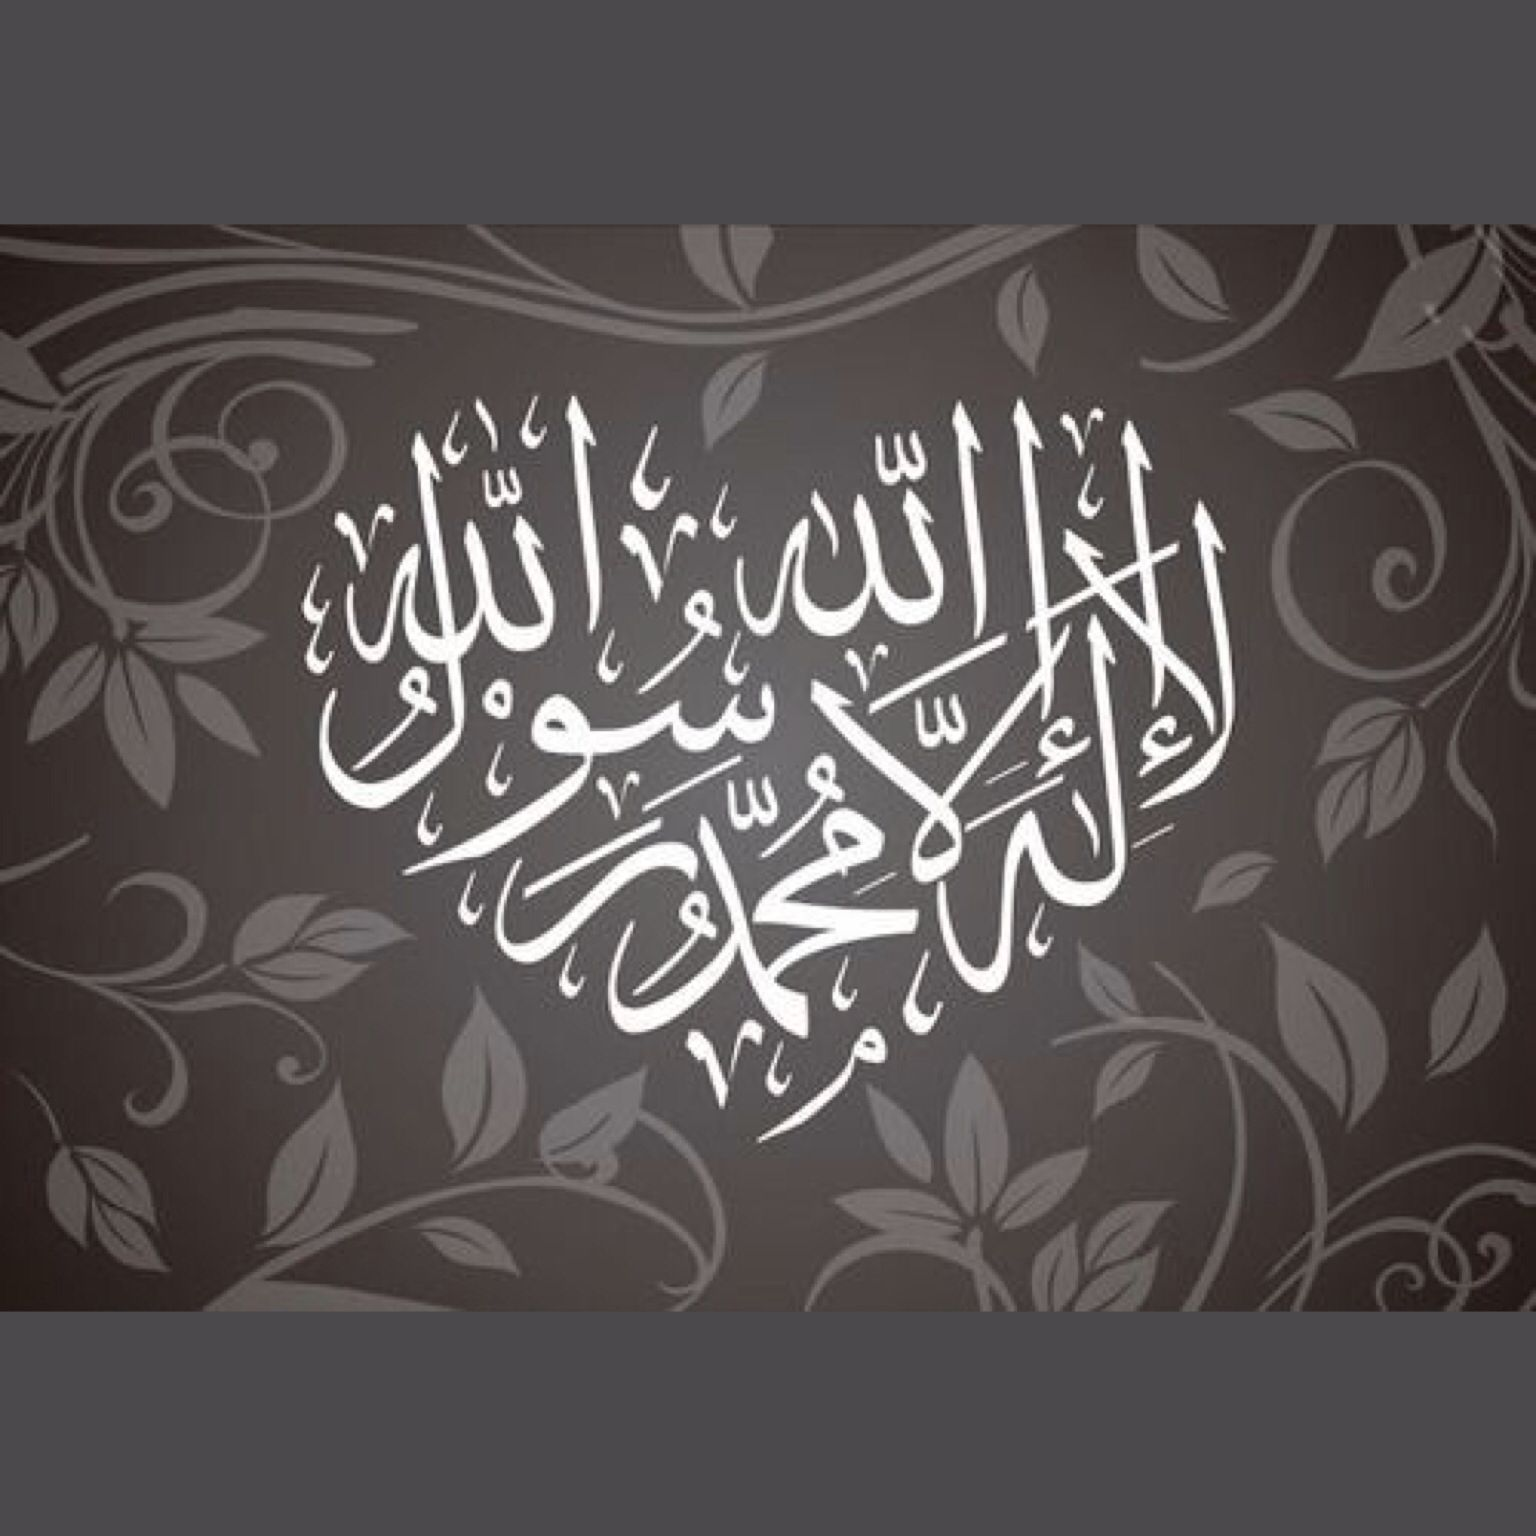 Pin By Hashem Ramezanzadeh On اذكار Islamic Art Calligraphy Islamic Caligraphy Islamic Calligraphy